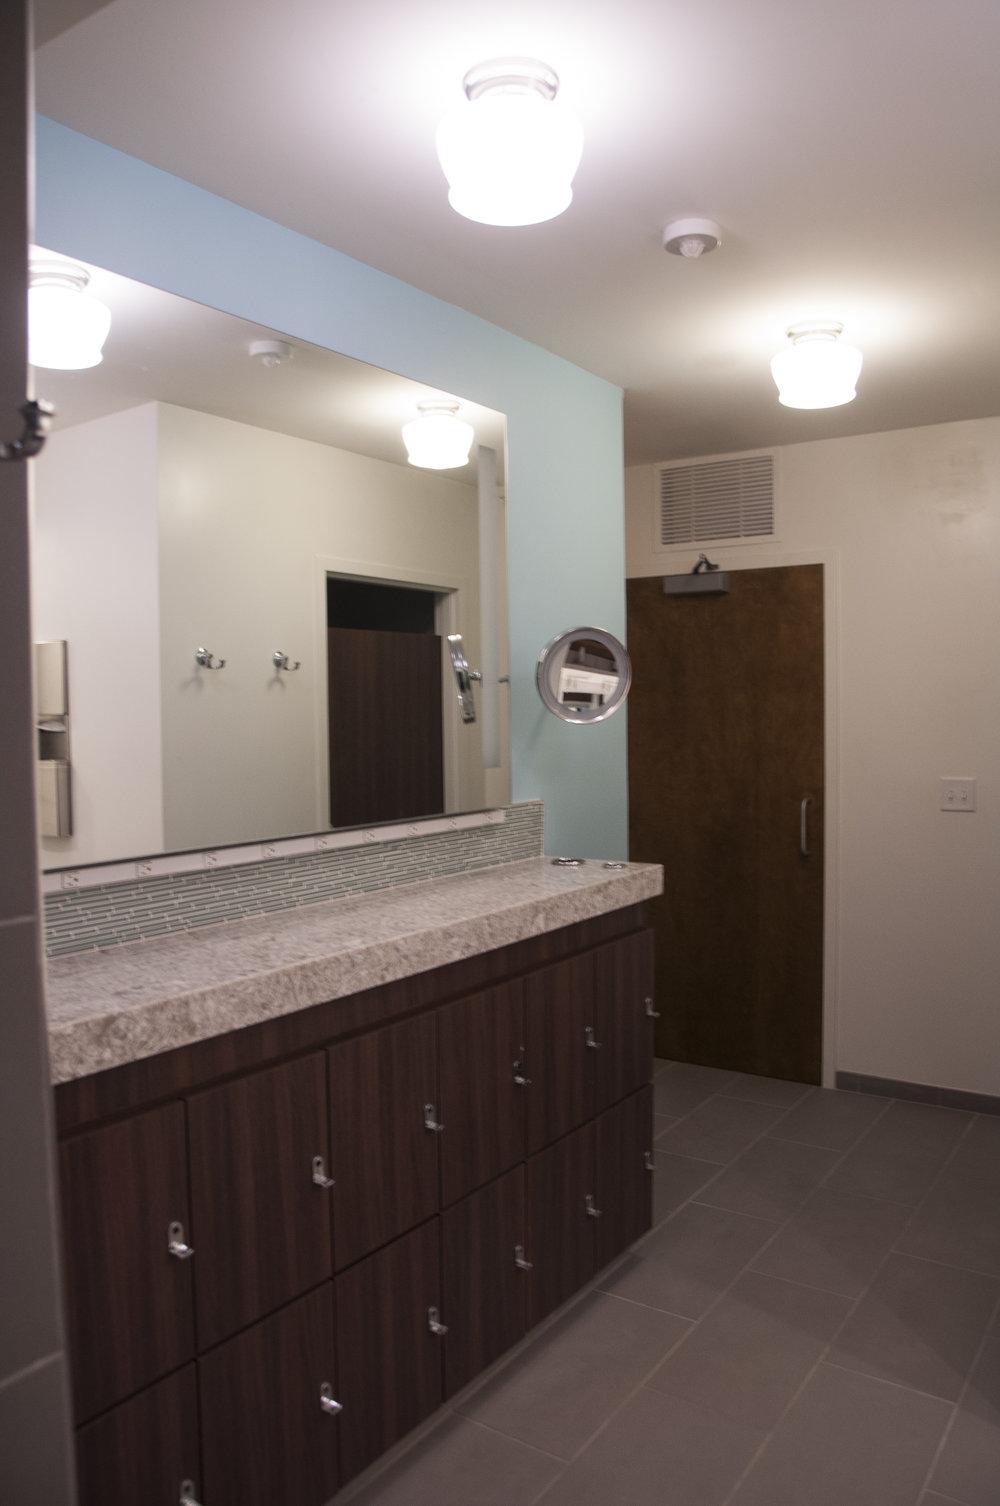 Interiors_AlphaPhi_Bathroom-15.jpg